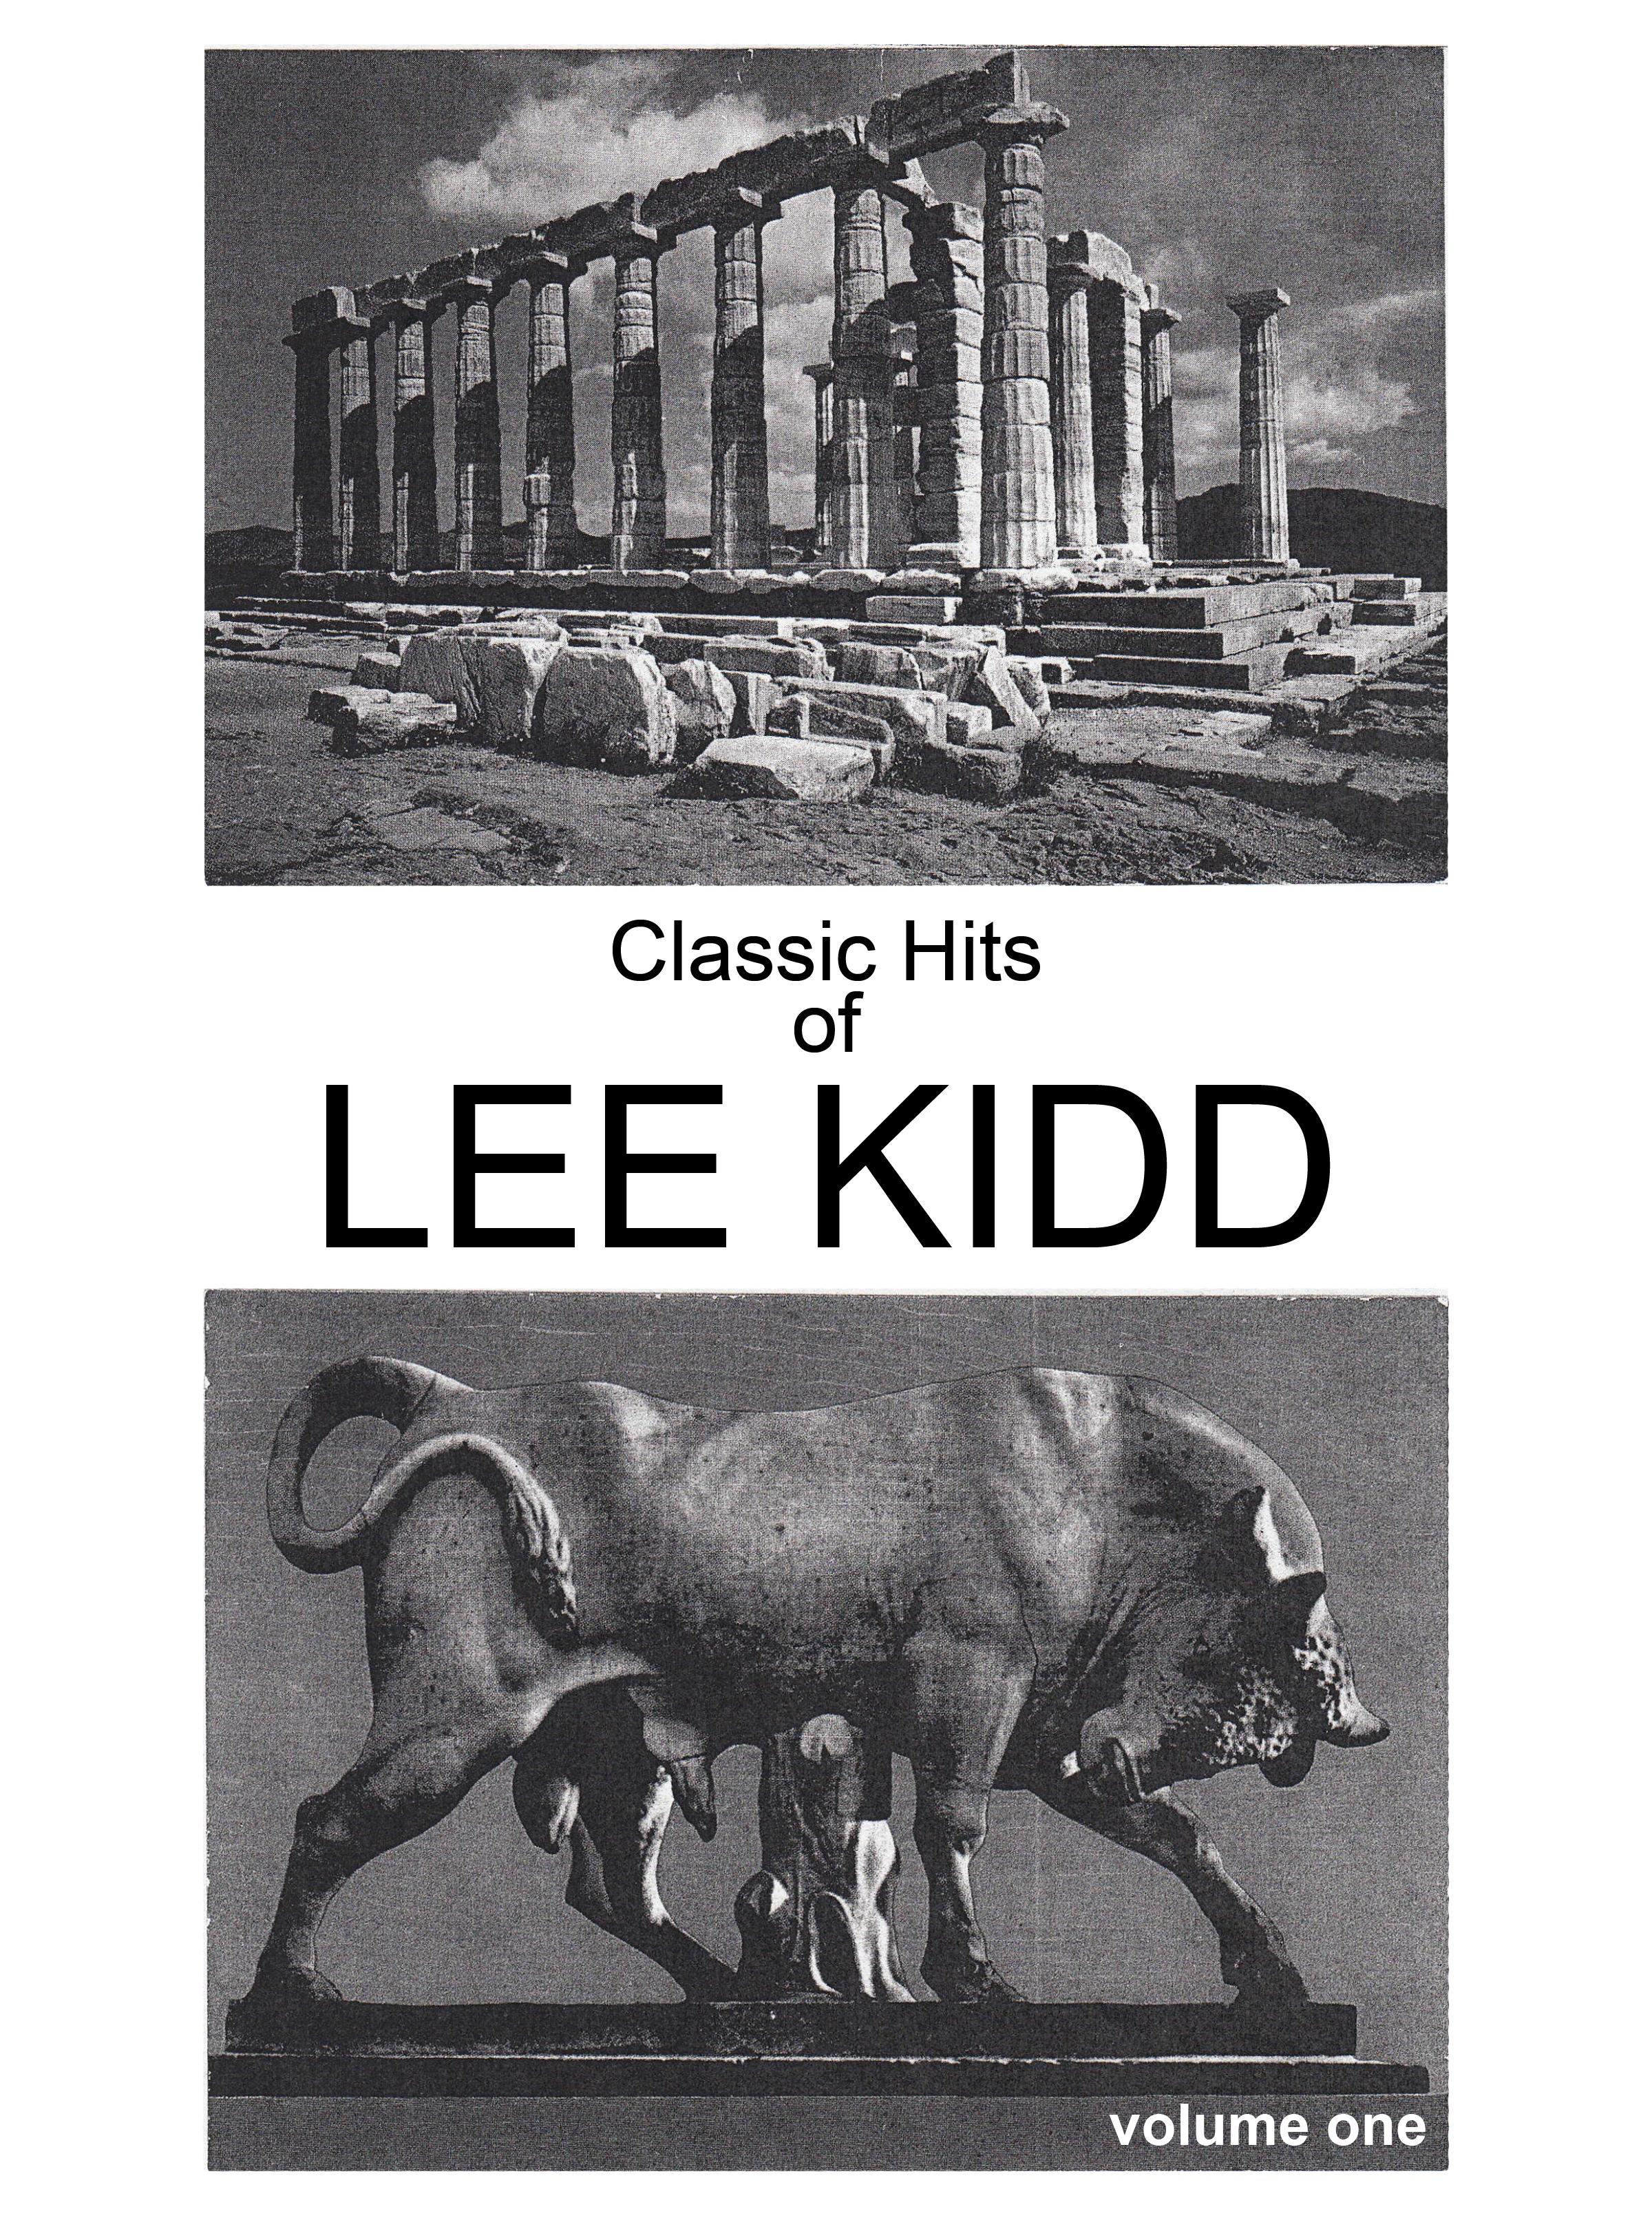 Classic Hits of Lee Kidd, volume one